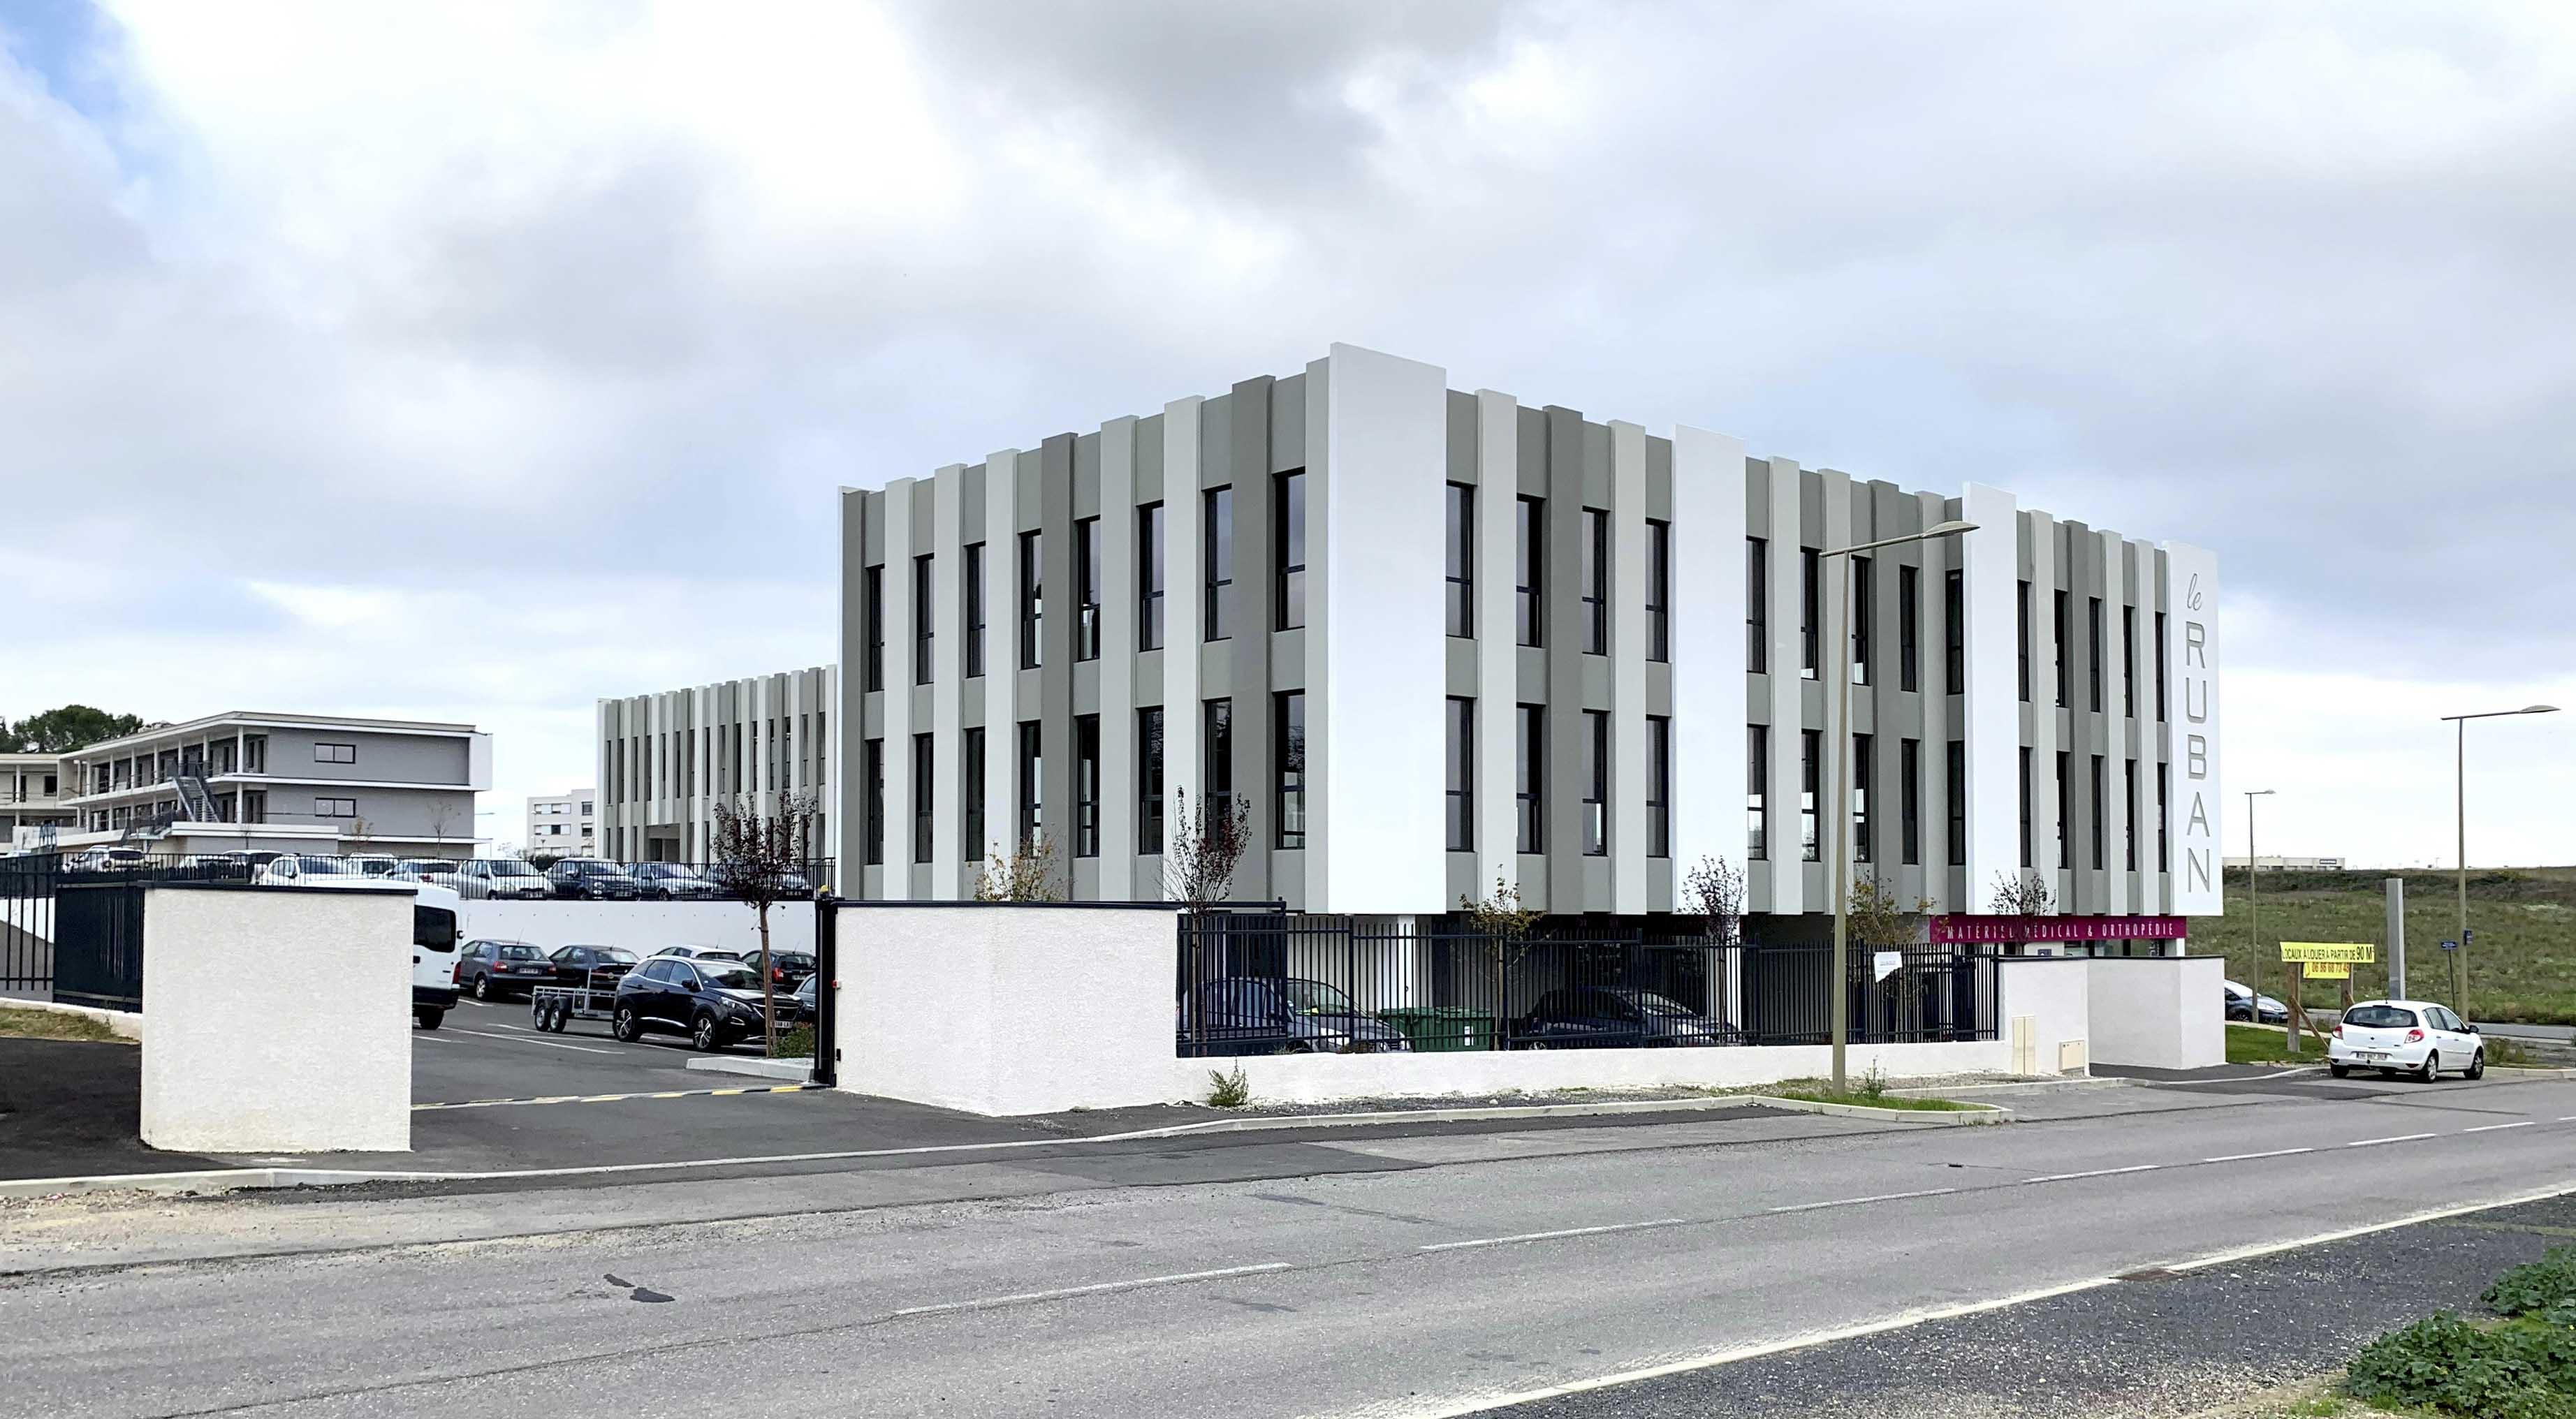 Immeuble le Ruban Béziers BF Architecture 2